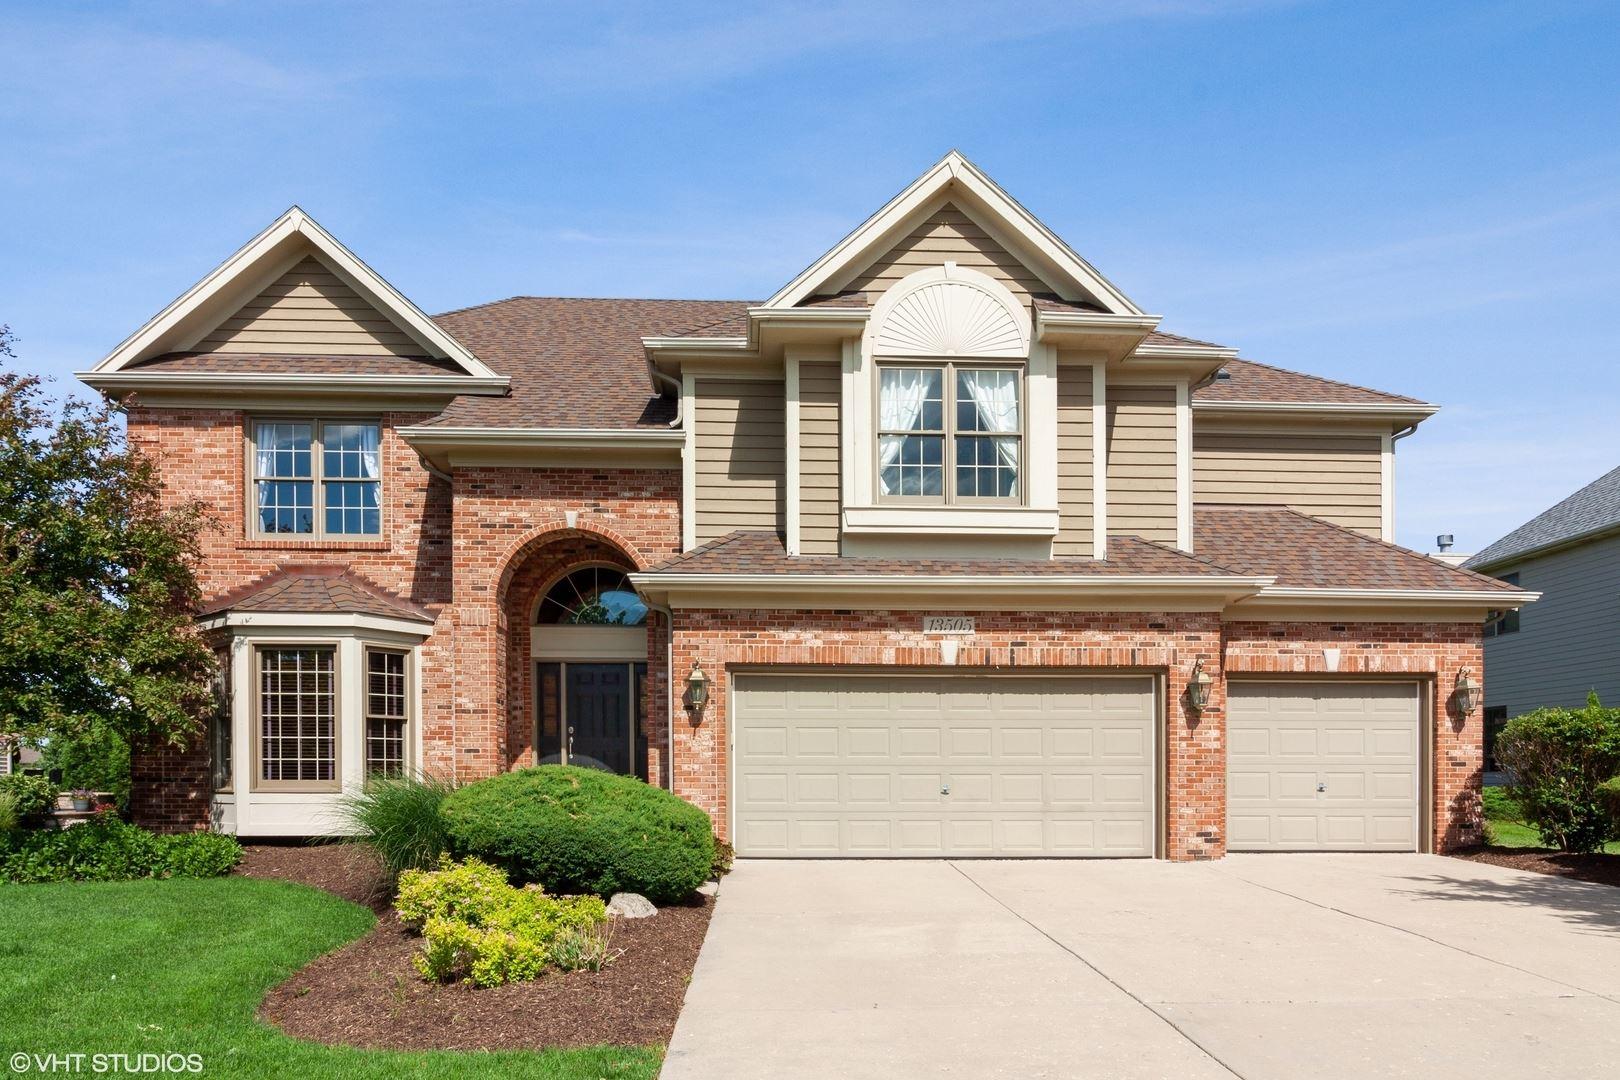 Photo of 13505 Summergrove Drive, Plainfield, IL 60585 (MLS # 10913636)